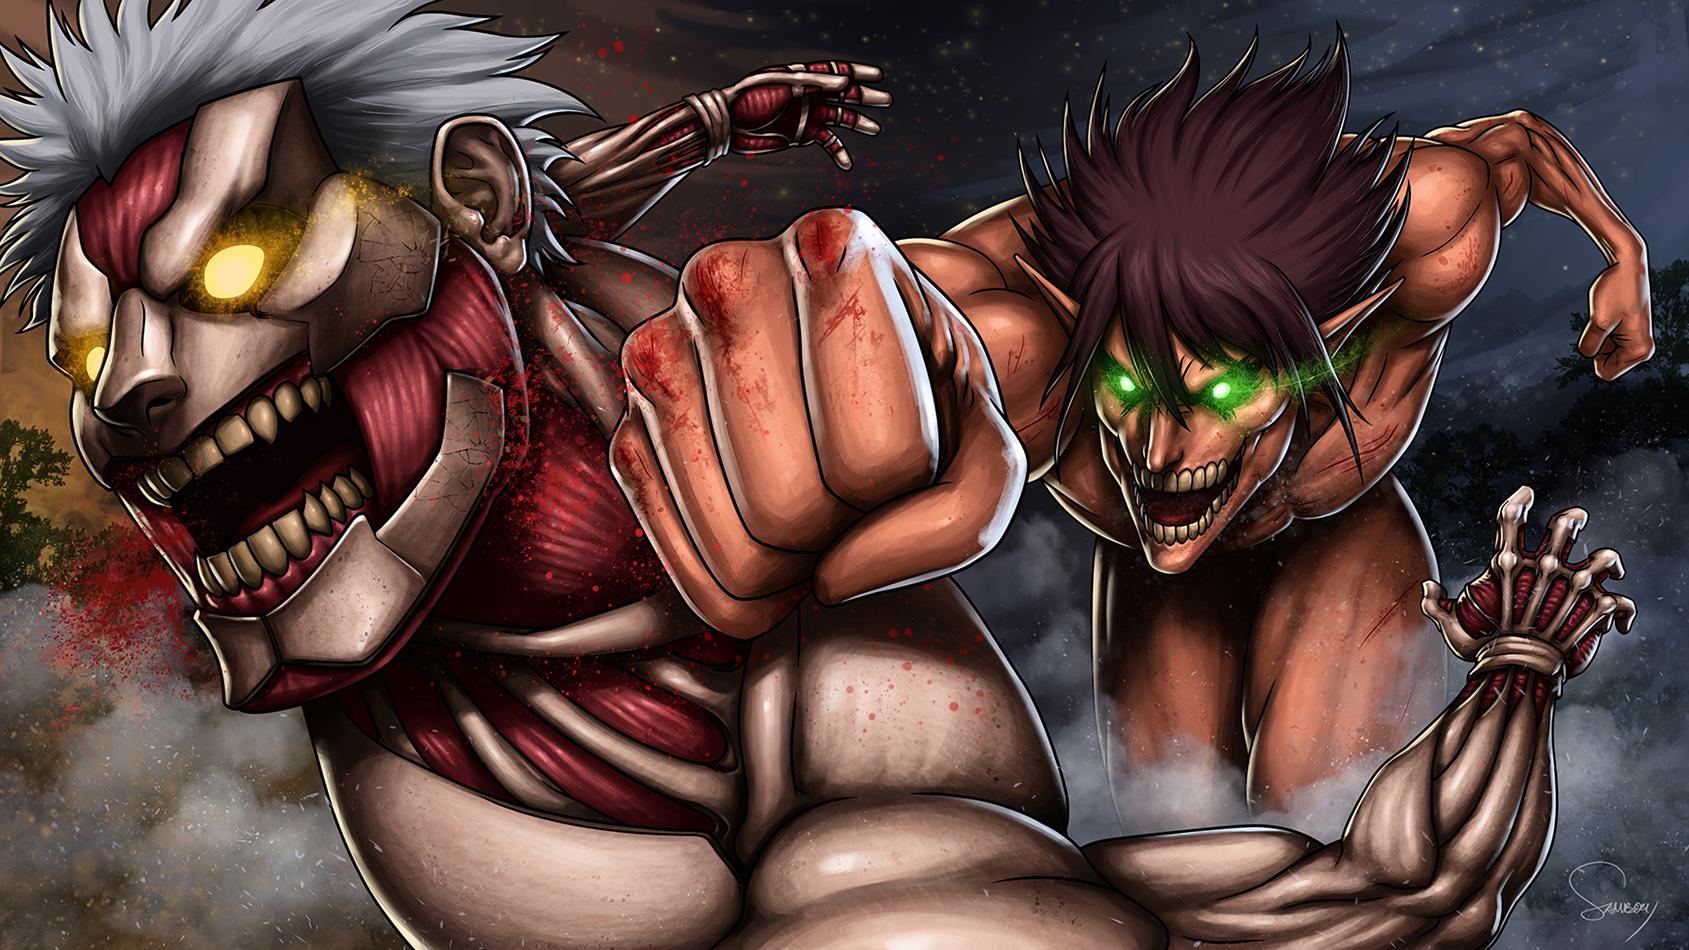 Attack on Titan Image #2355006 - Zerochan Anime Image Board